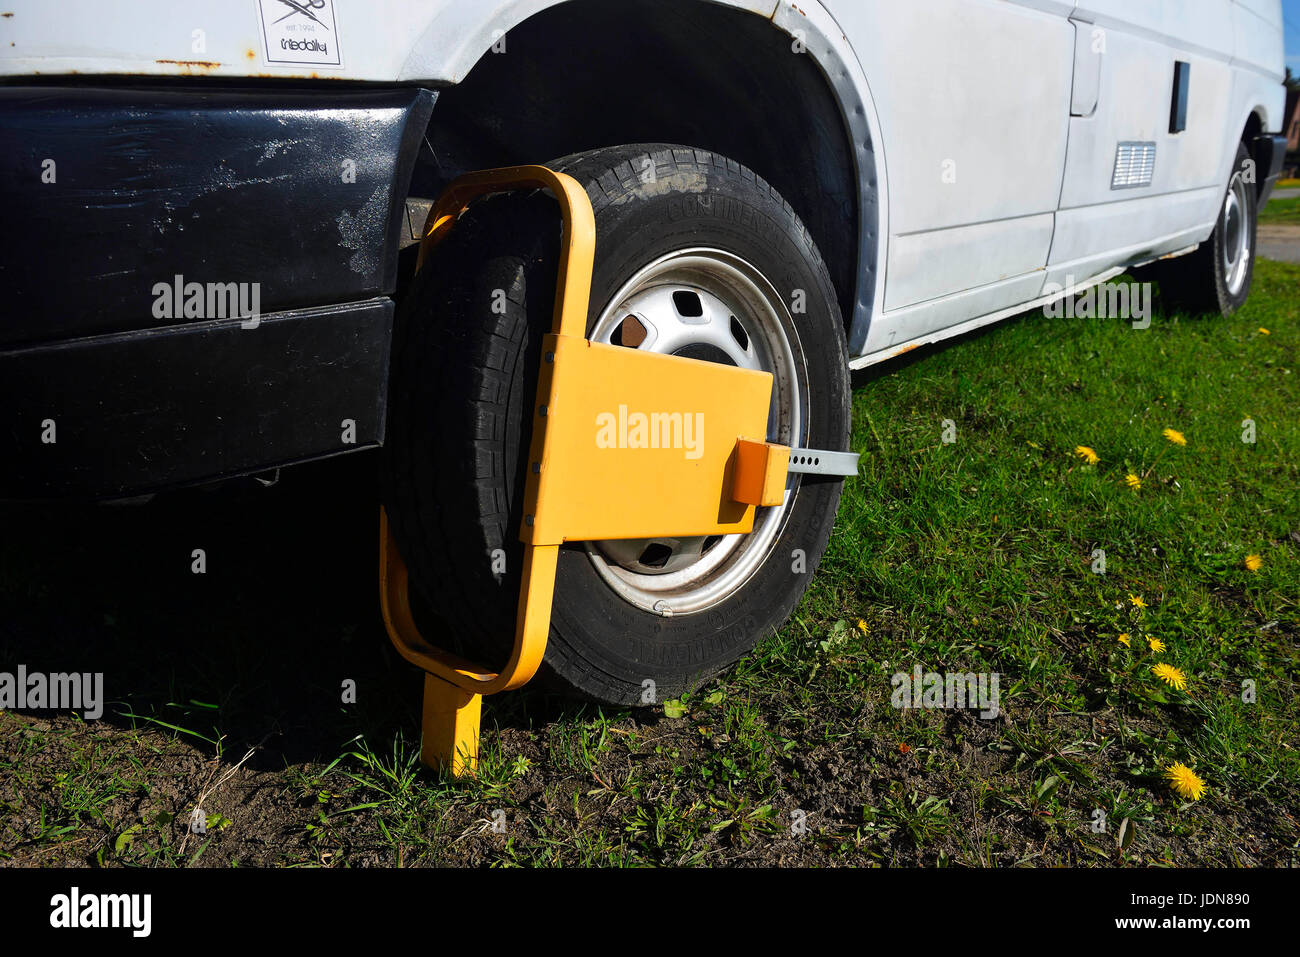 Park claw in a vehicle, Parkkralle an einem Fahrzeug - Stock Image